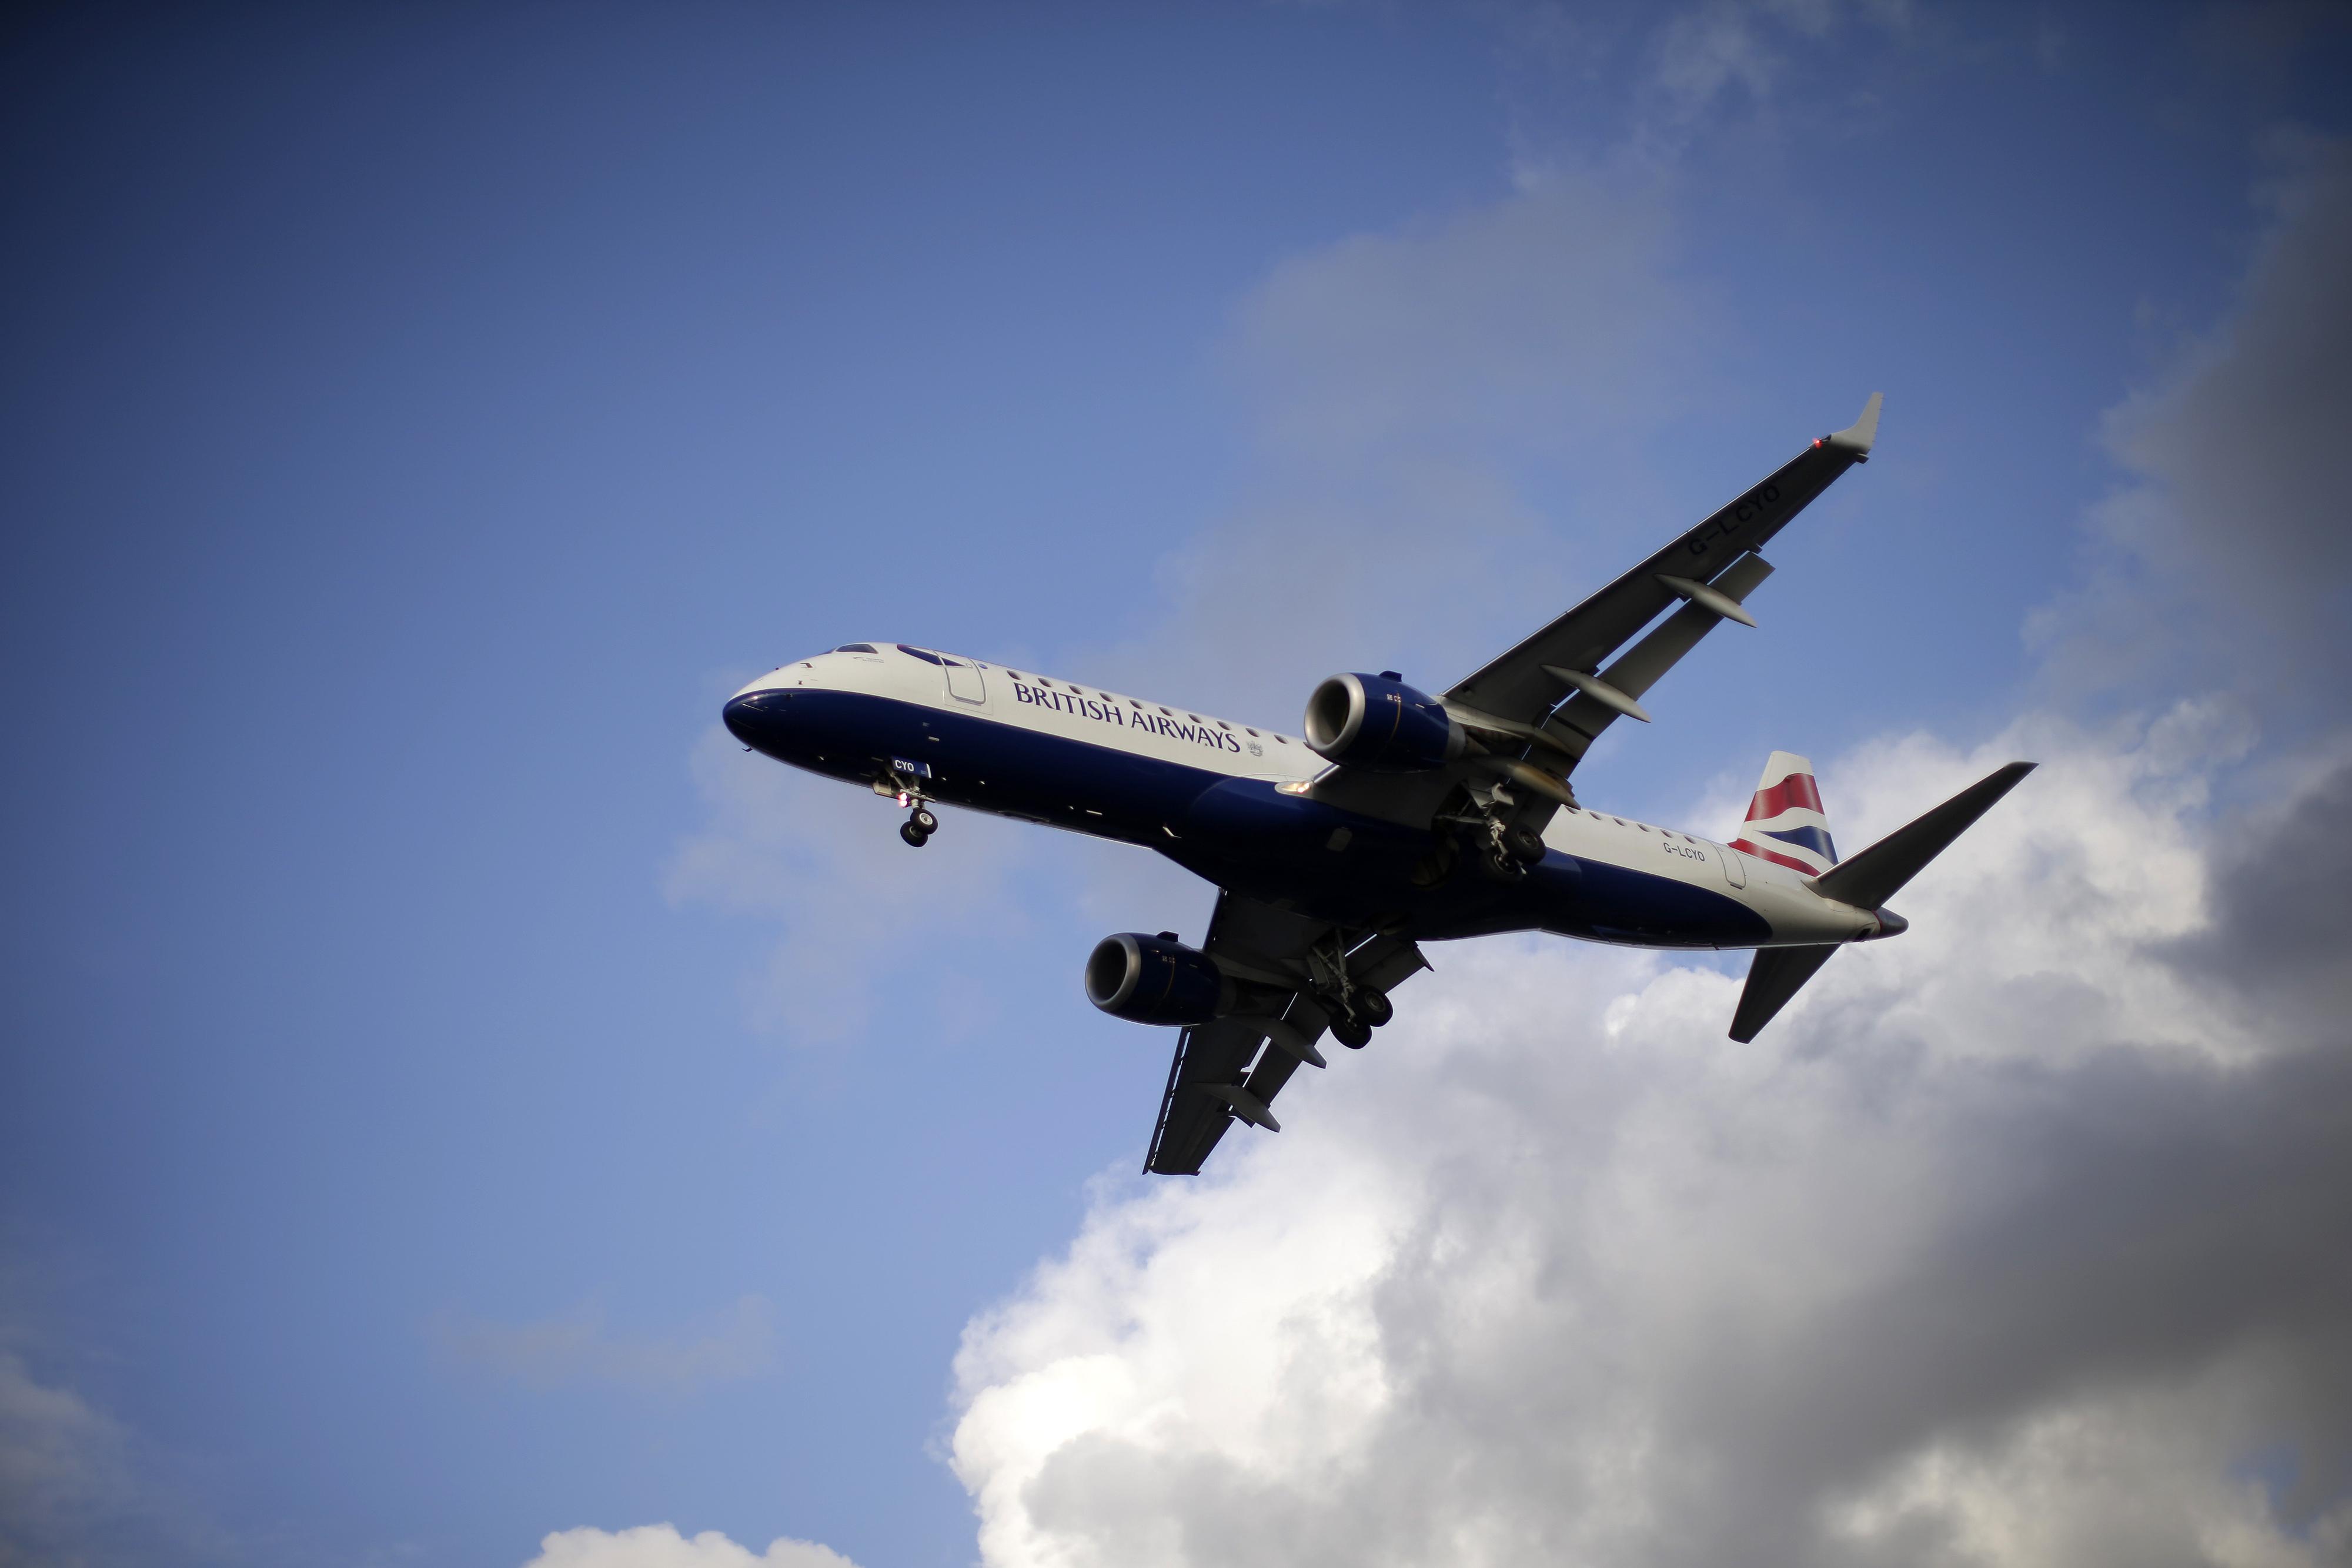 British Airways breach caused by credit card skimming malware